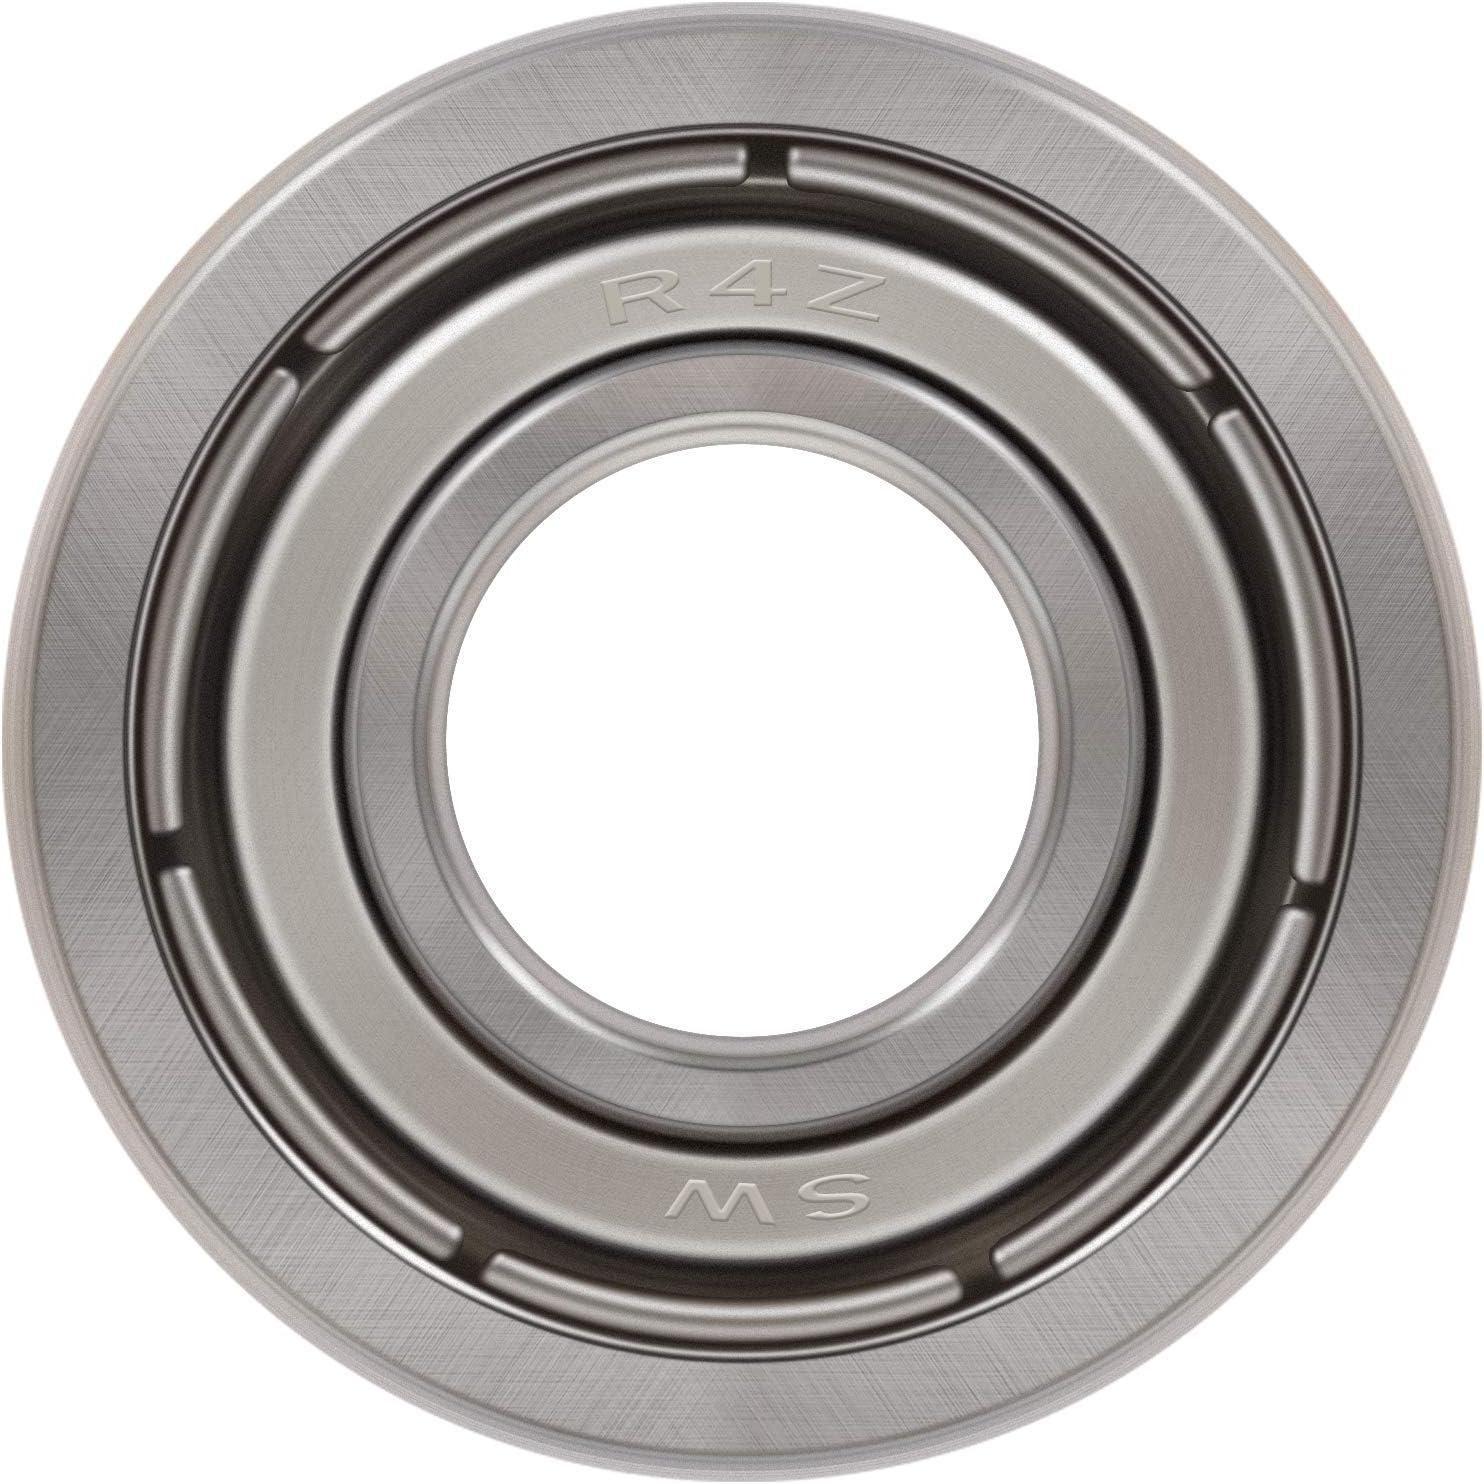 Bonbo 10Pcs R4-ZZ Bearings 1//4 x 5//8 x 10//51 inch,Double Metal Shielded,Deep Groove Ball Bearings for Electric Motor Appliances